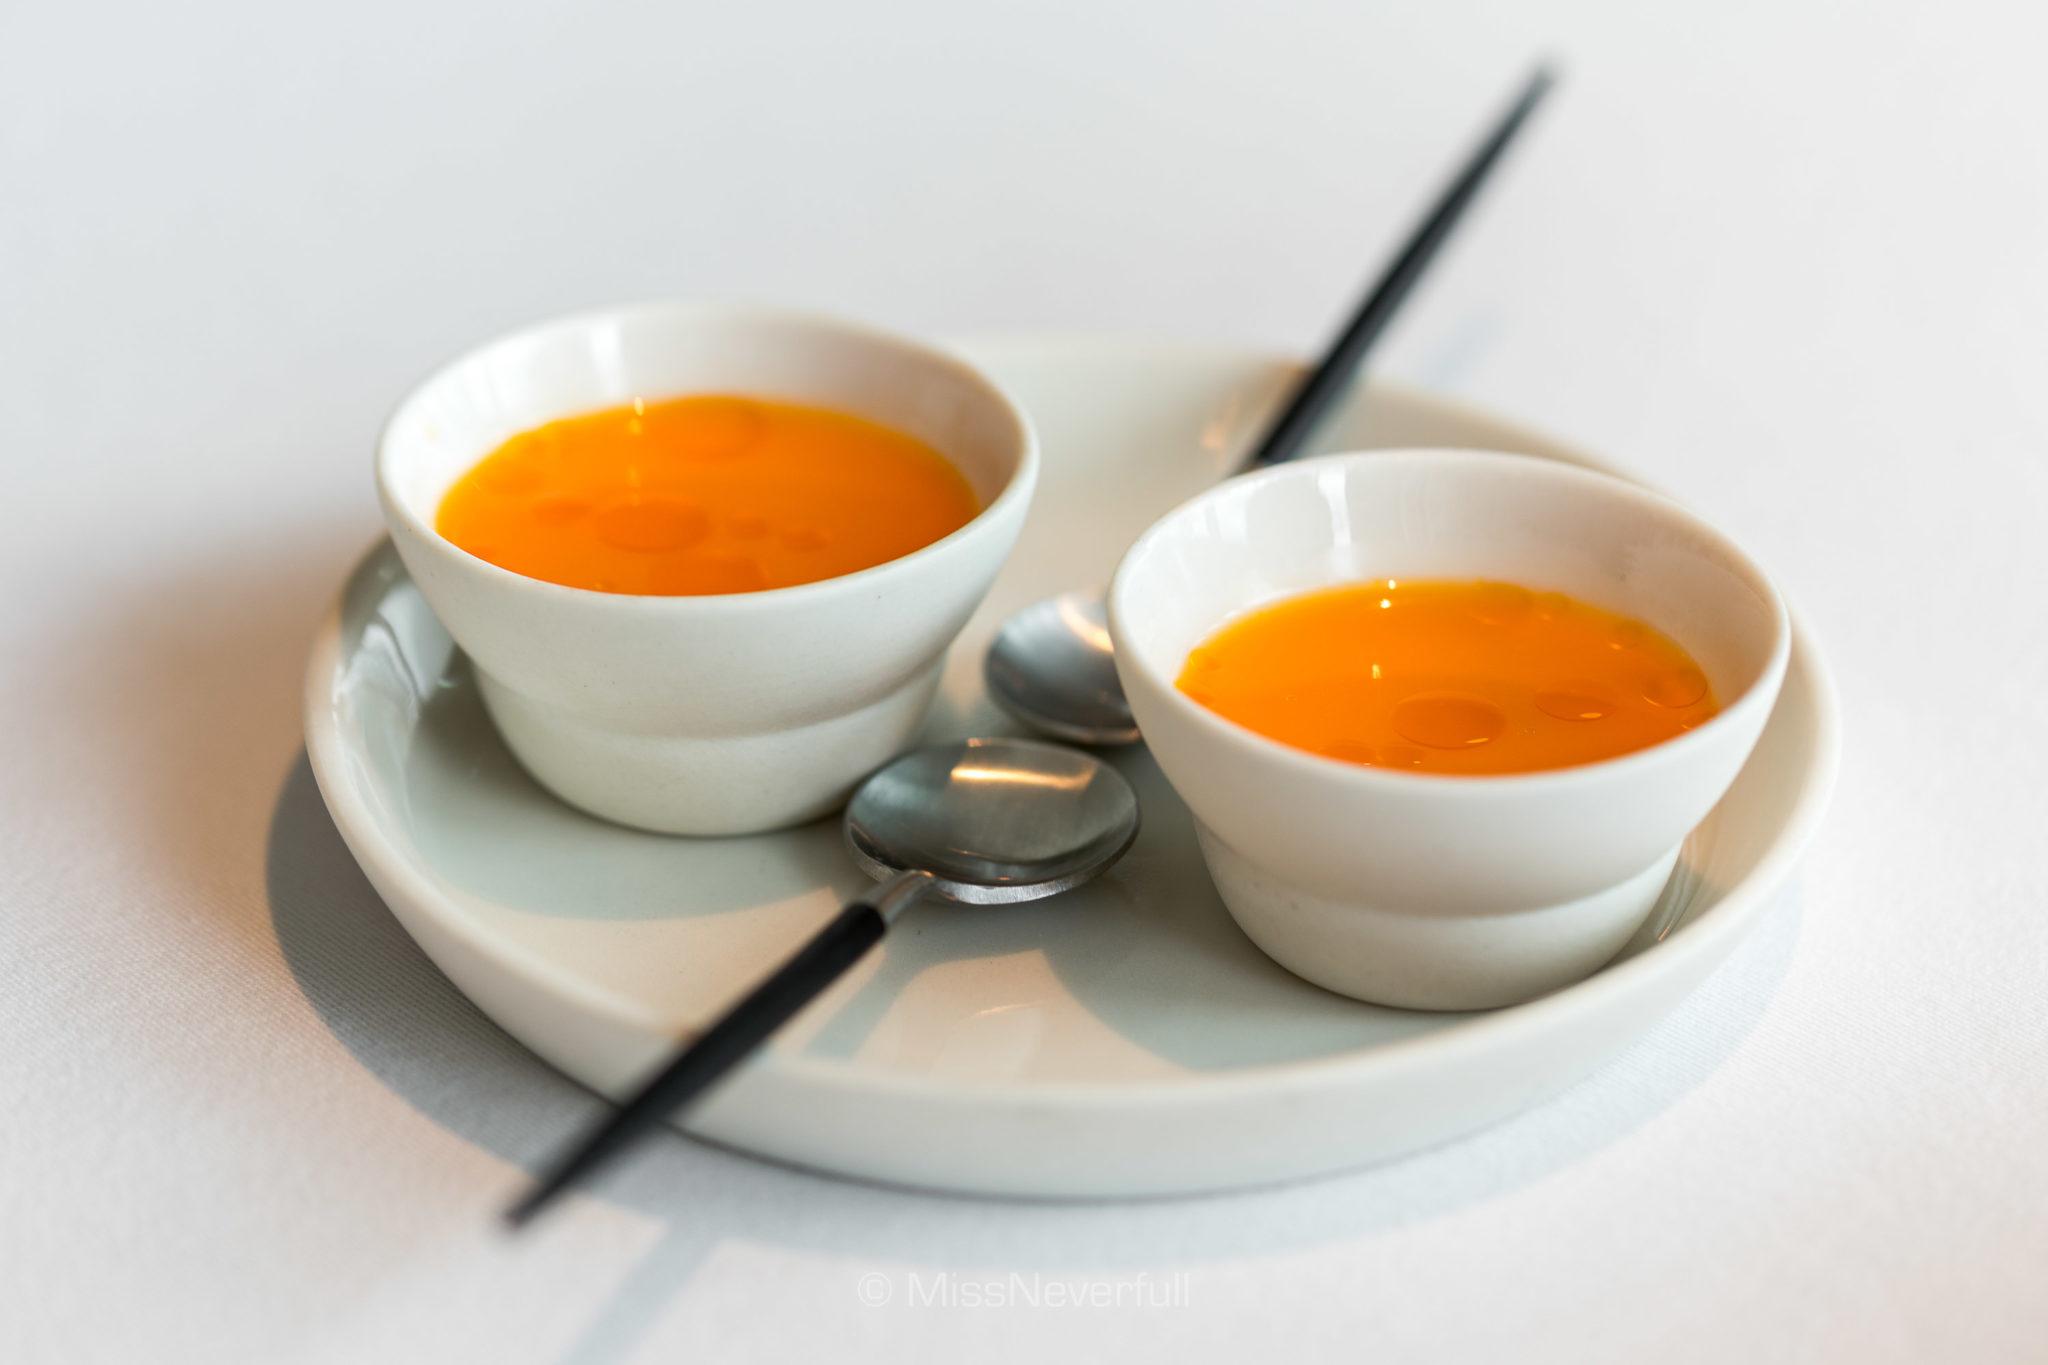 1.1 Lobster, milk & juice from fermented carrots & sea buckthorn